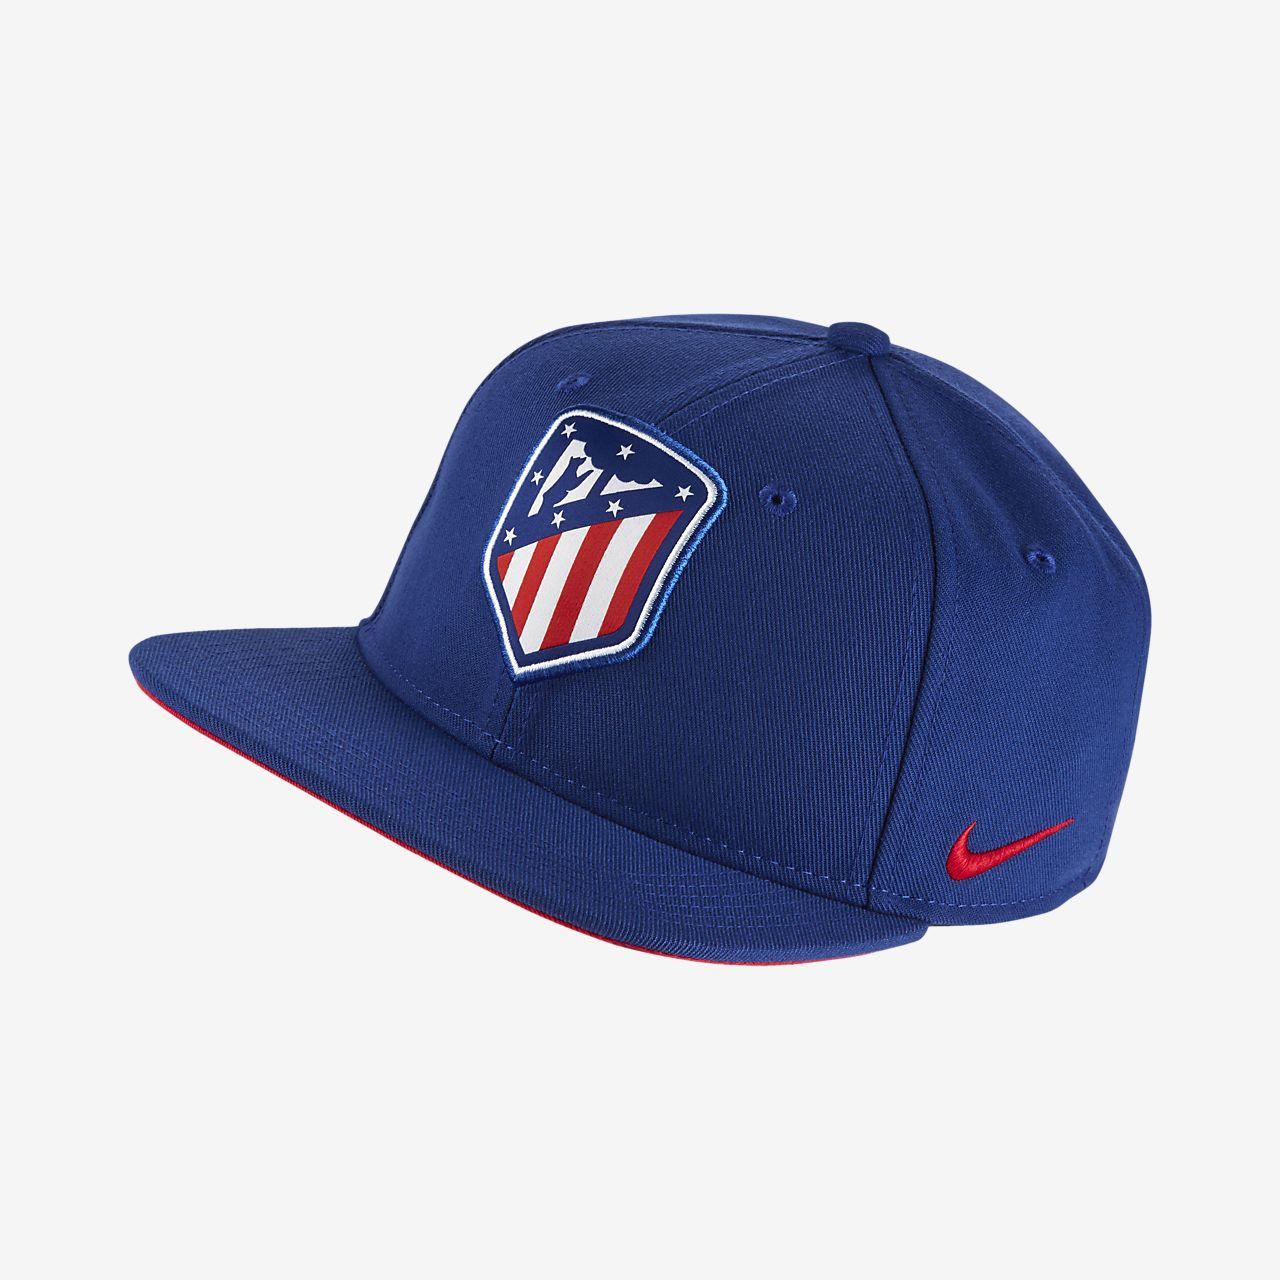 Justerbar keps Nike Pro Atlético de Madrid för ungdom